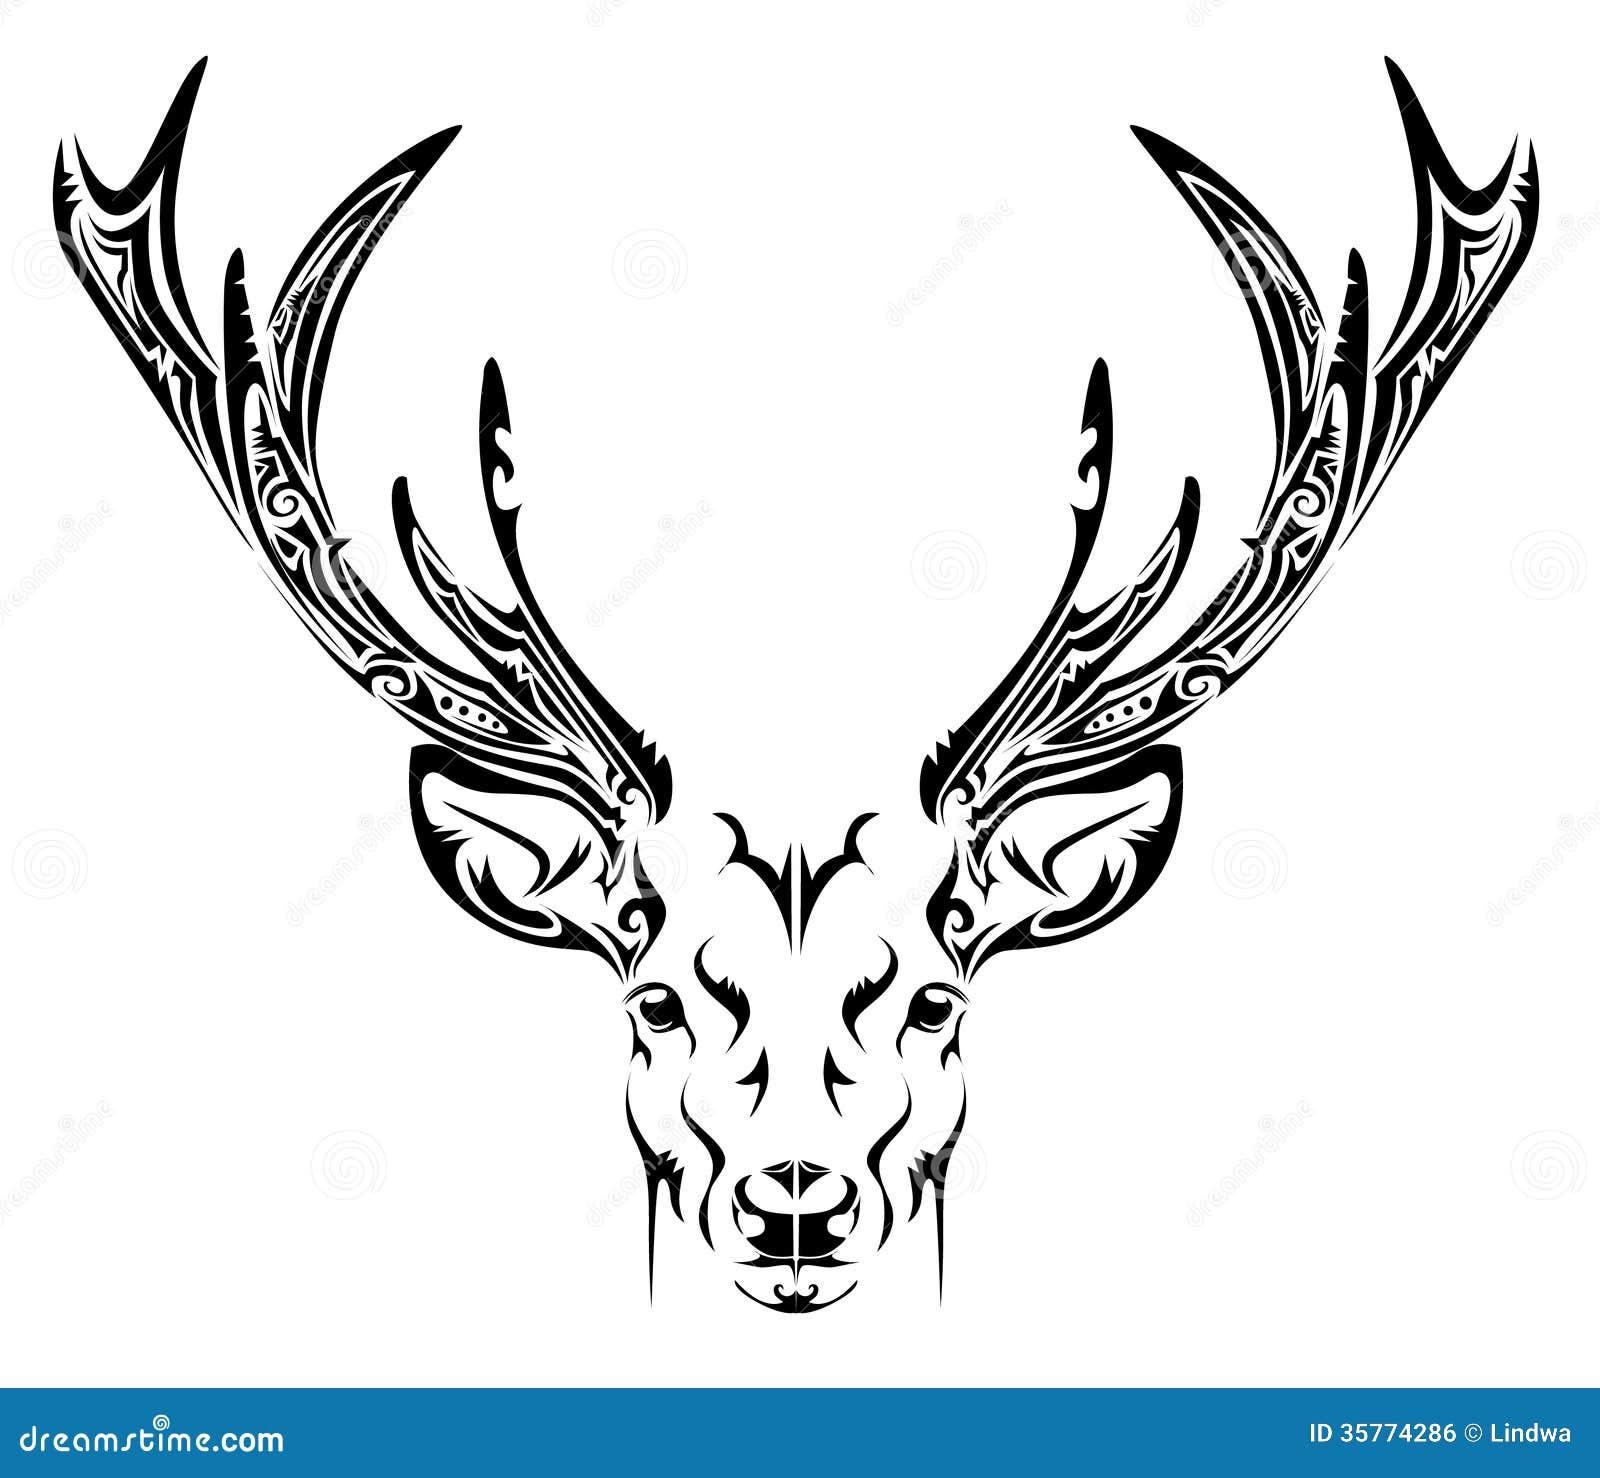 Reindeer Face Line Drawing : 小腿鹿头纹身内容图片分享